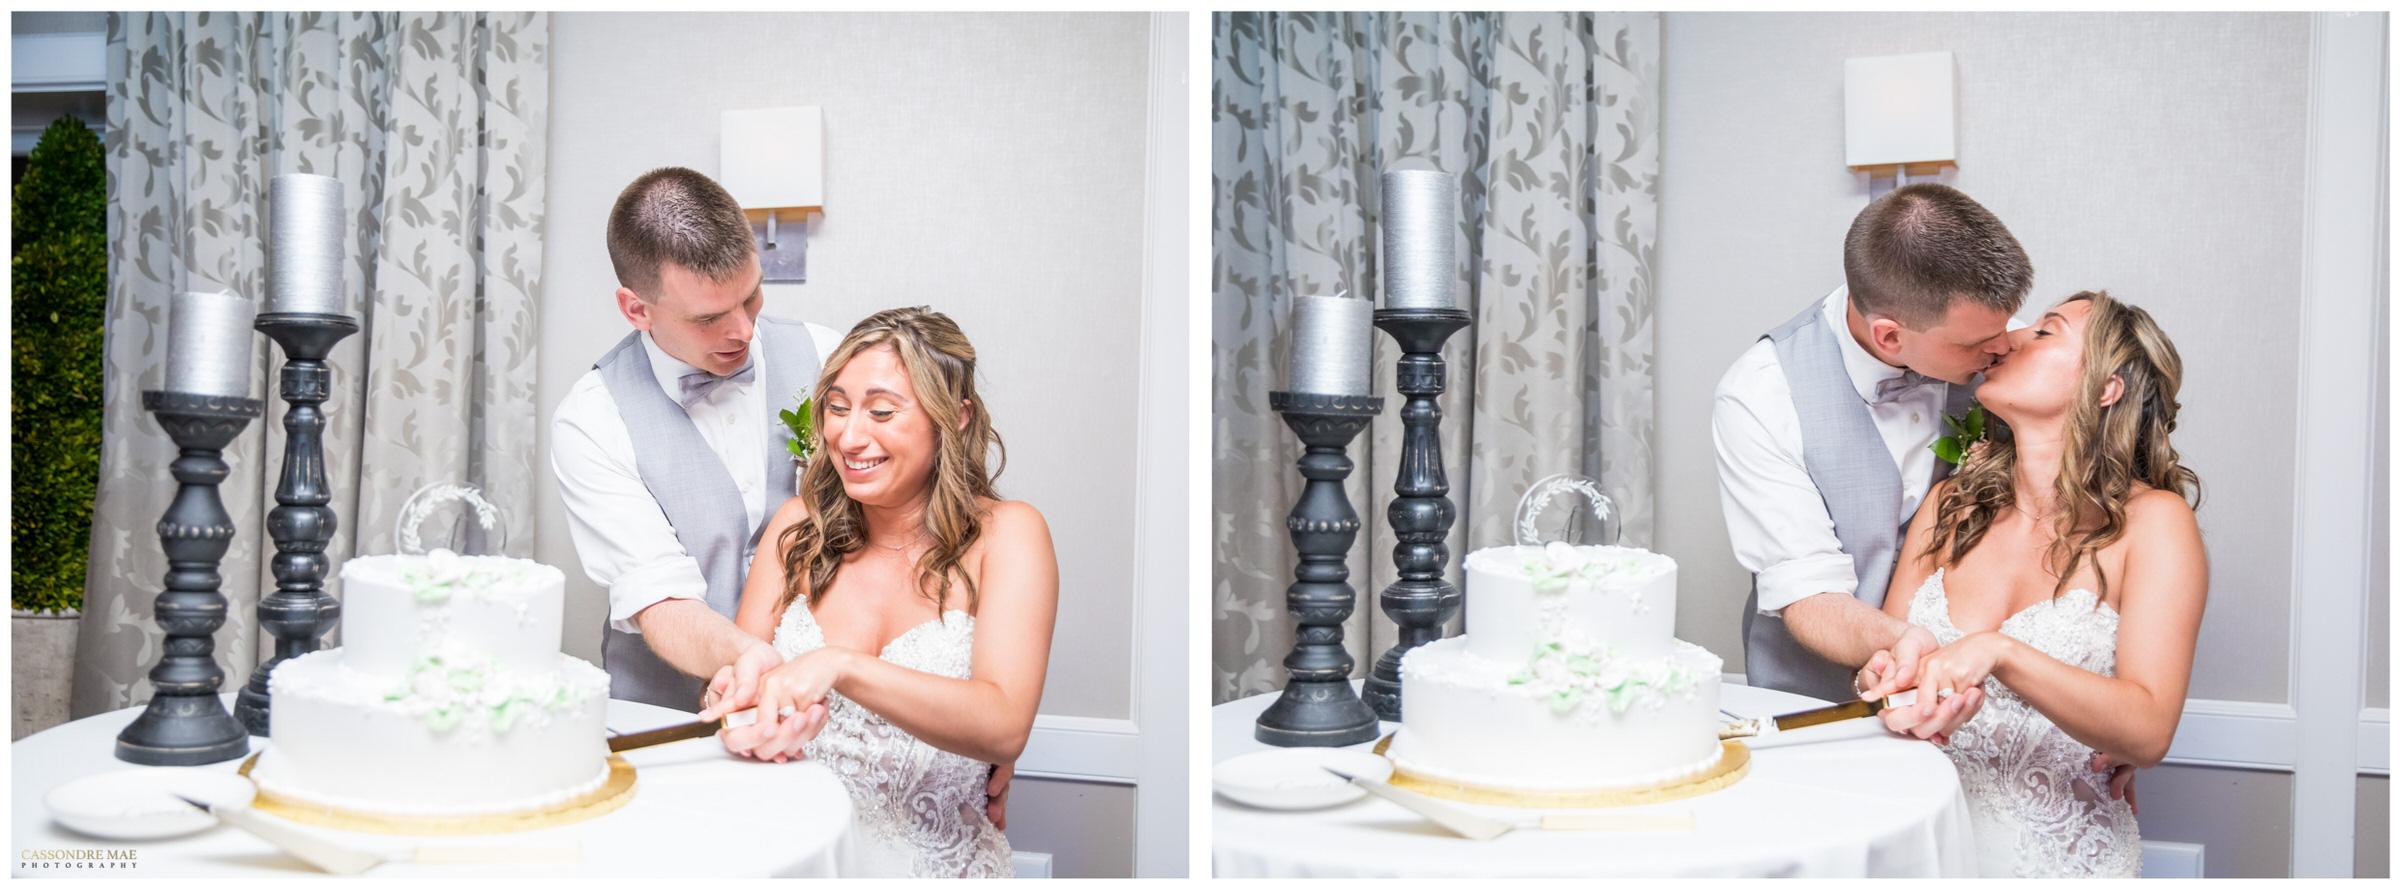 Cassondre Mae Photography Wedding Photographer.jpg